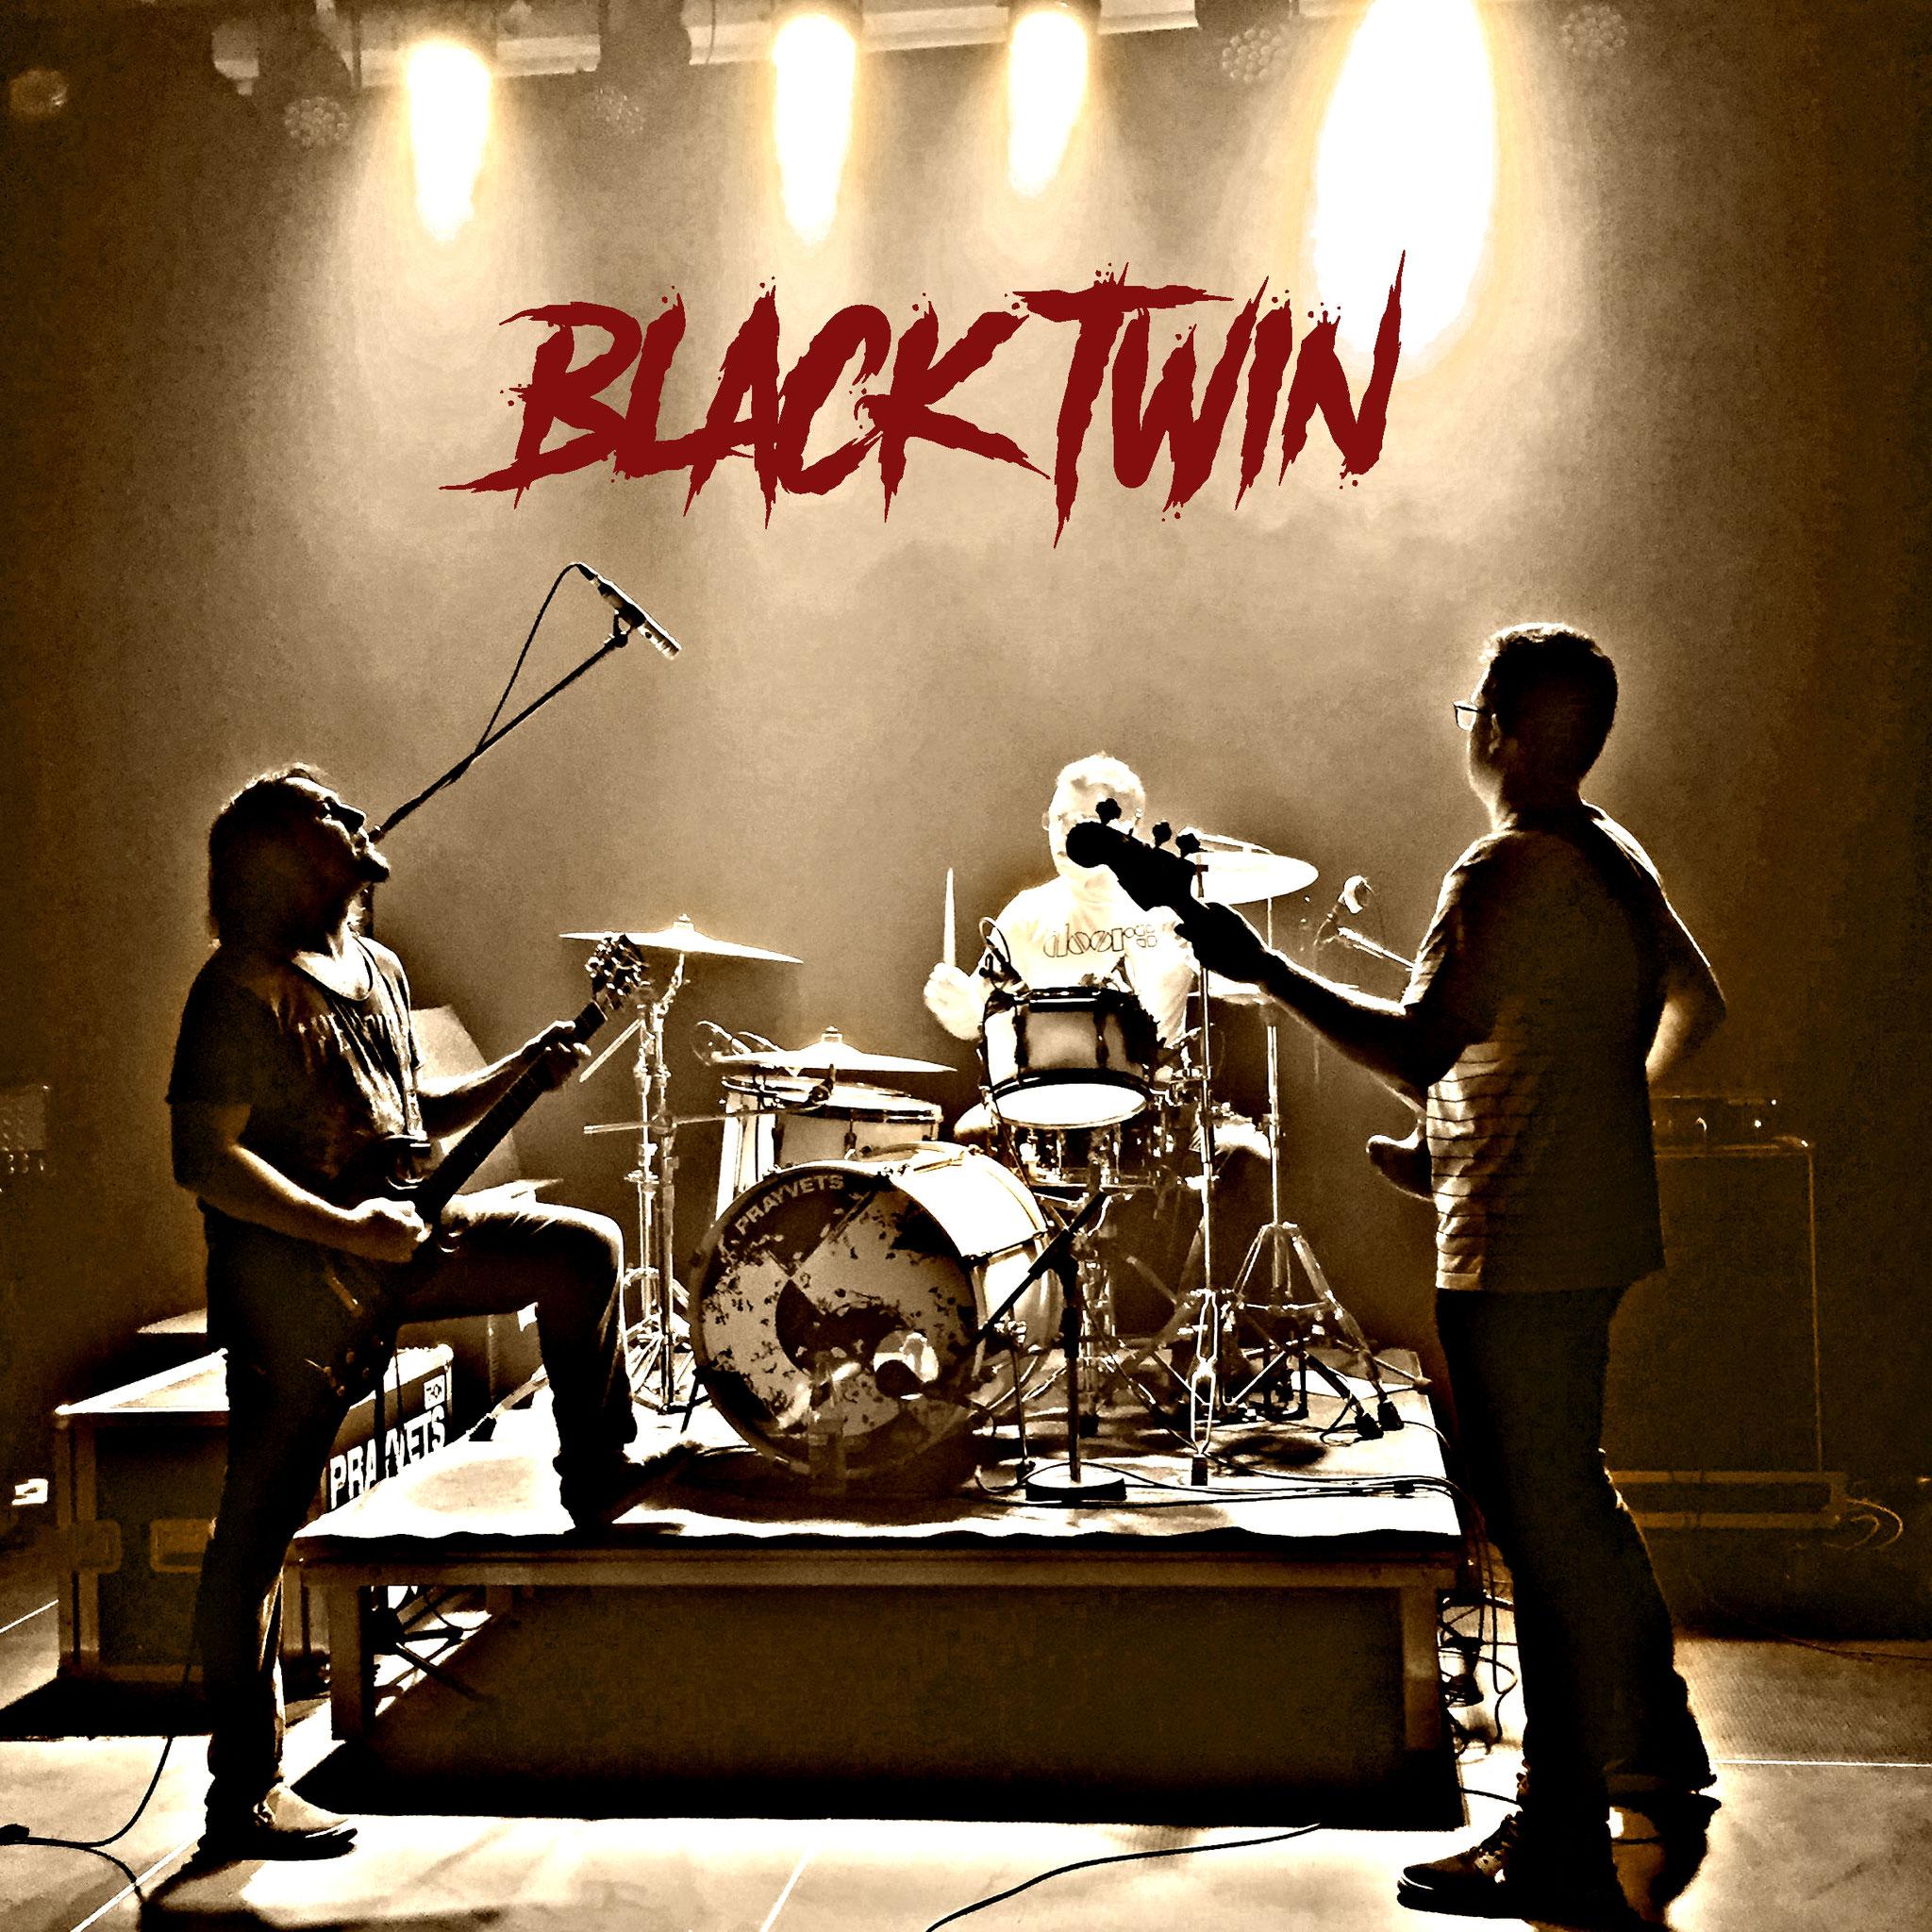 BLACKTWIN